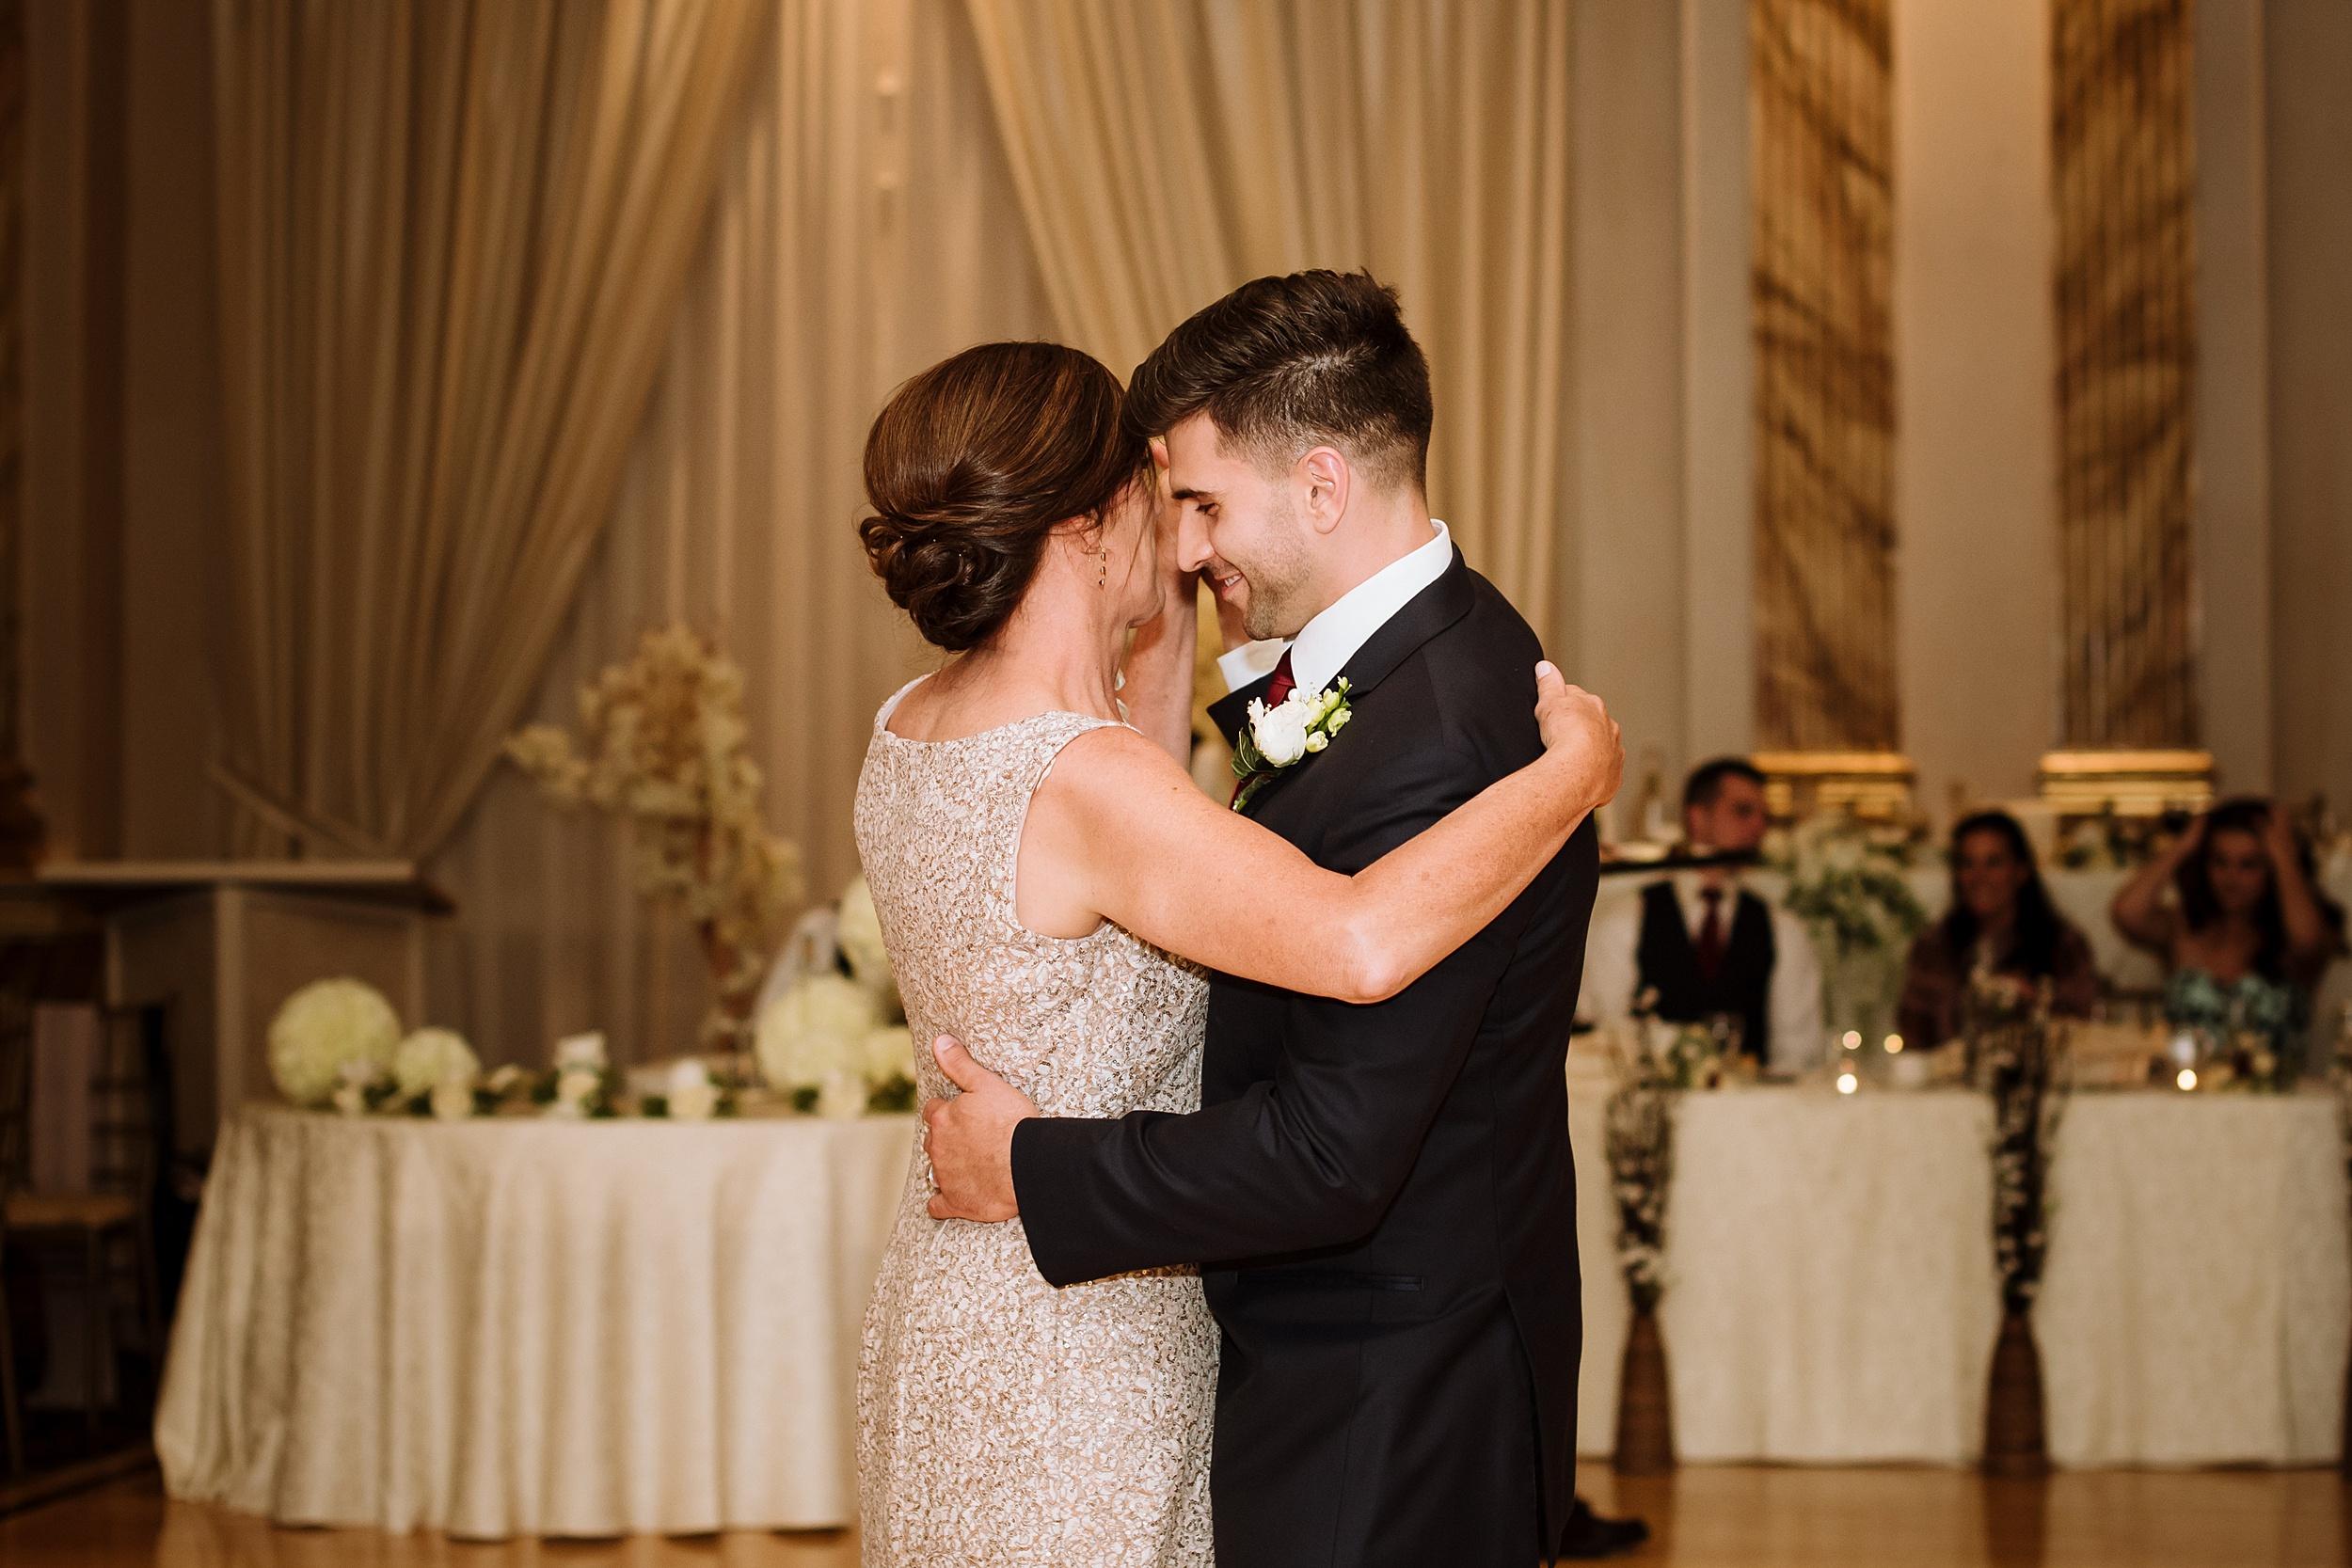 McMichael_Art_Collection_Wedding_chateau_le_jardin_Justine_Munro_Toronto_Photographer086.jpg